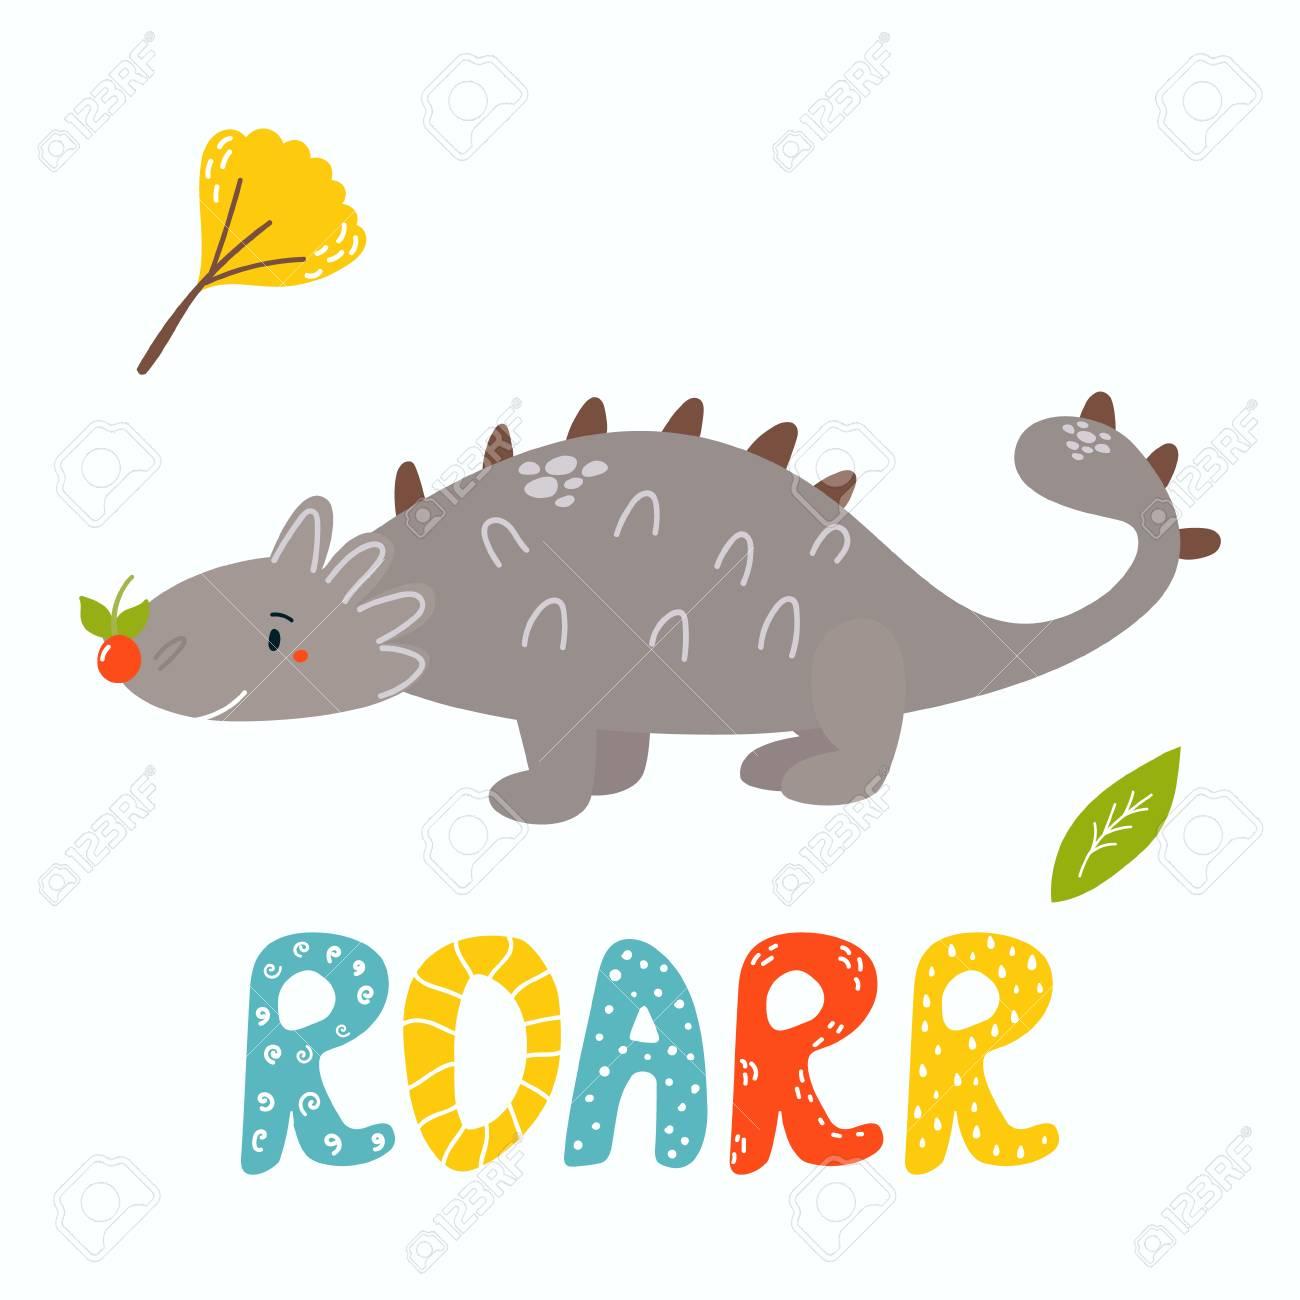 Cute ankylosaurus dino. Roarr greeting card.